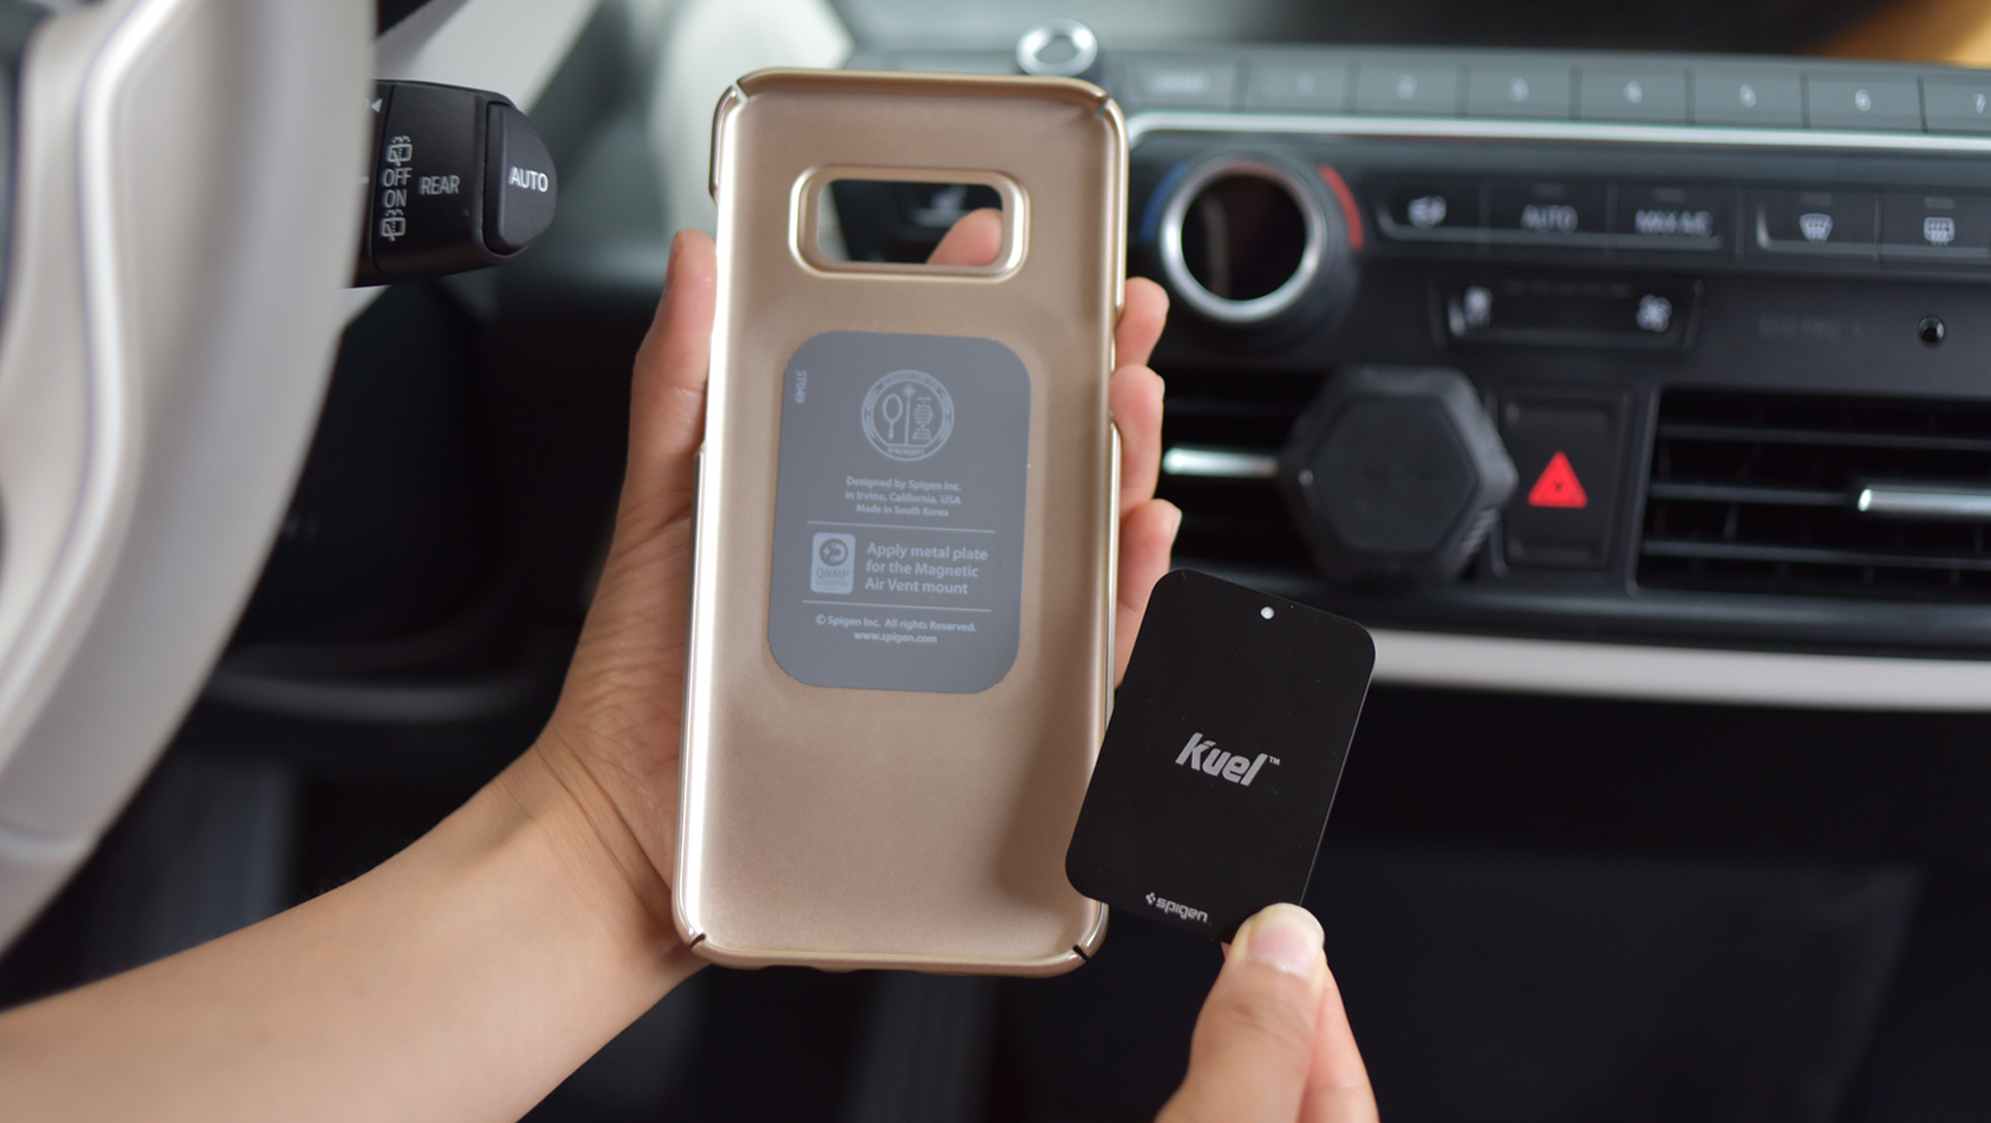 newest 2d800 6f180 Get Spigen's super slim Kuel QS11 Magnetic Car iPhone Mount for ...